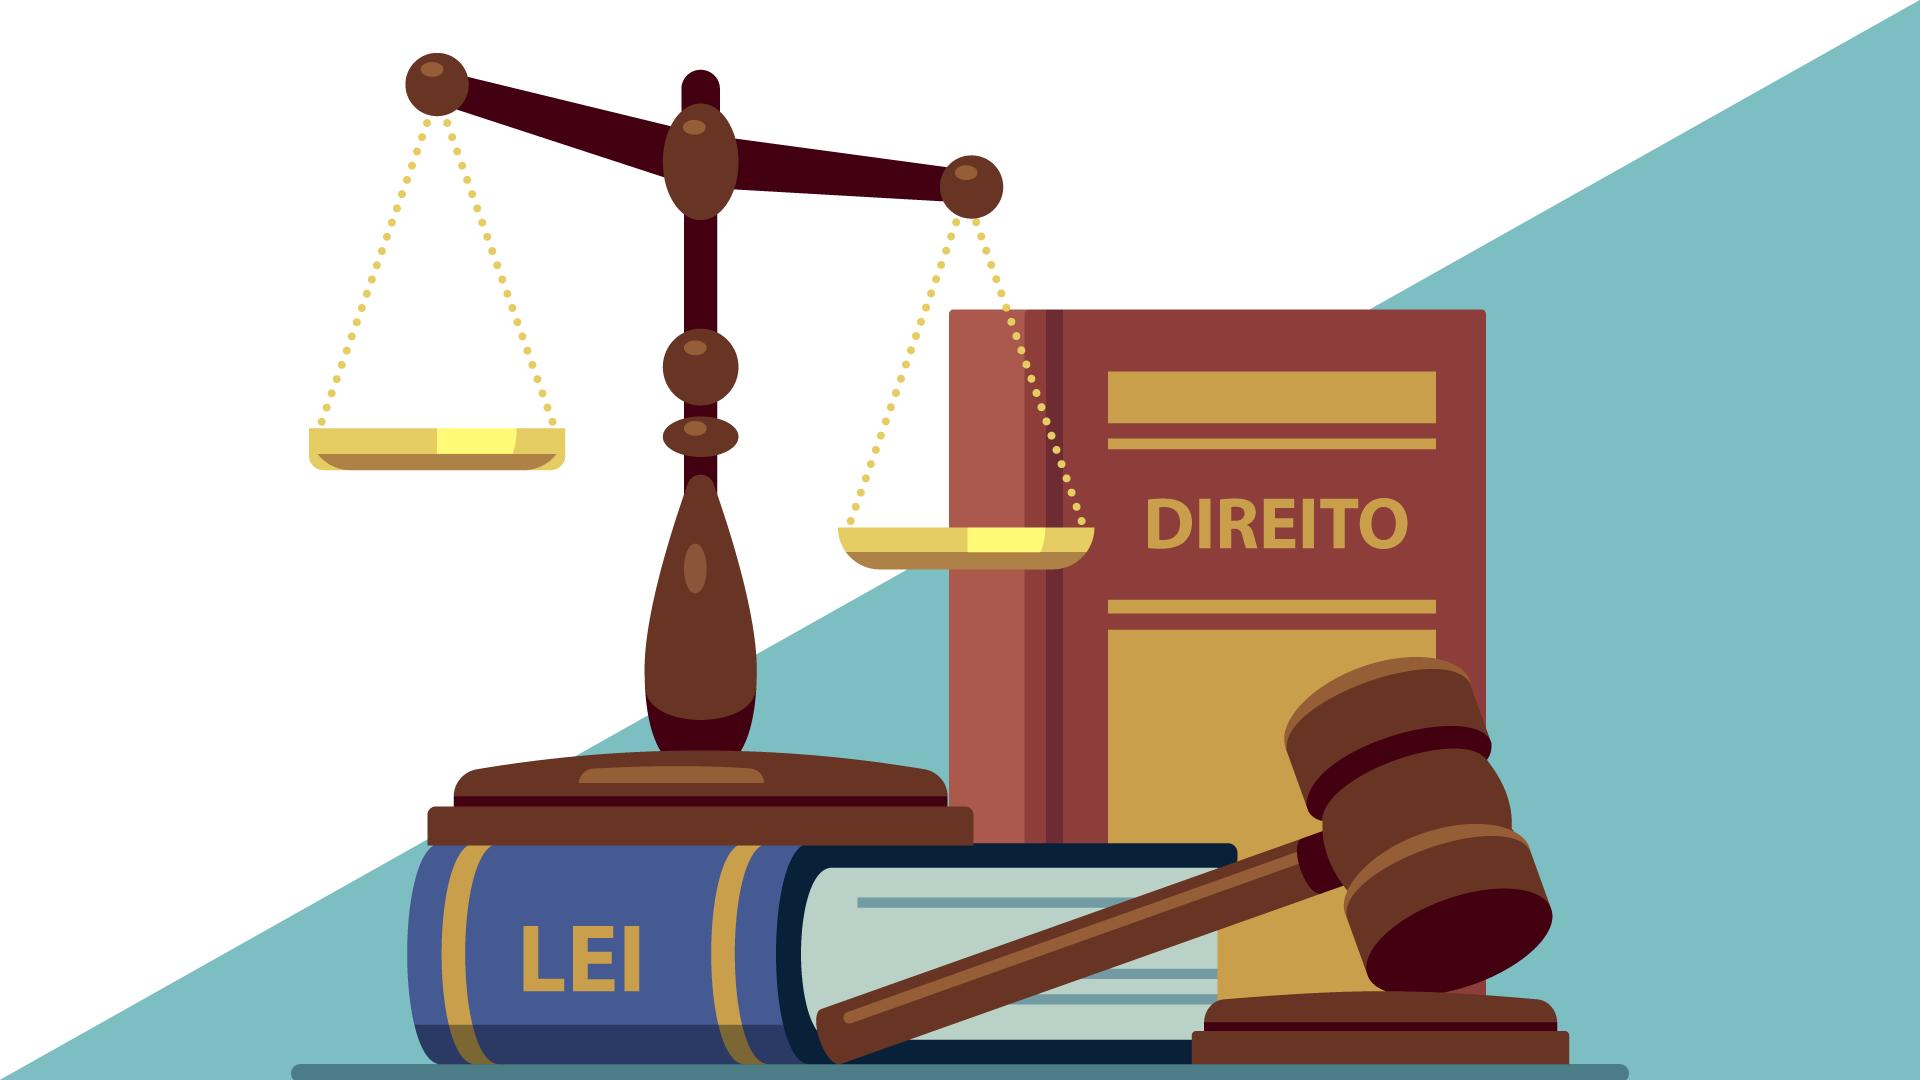 Curso de Direito: 10 coisas que todo futuro acadêmico precisa saber